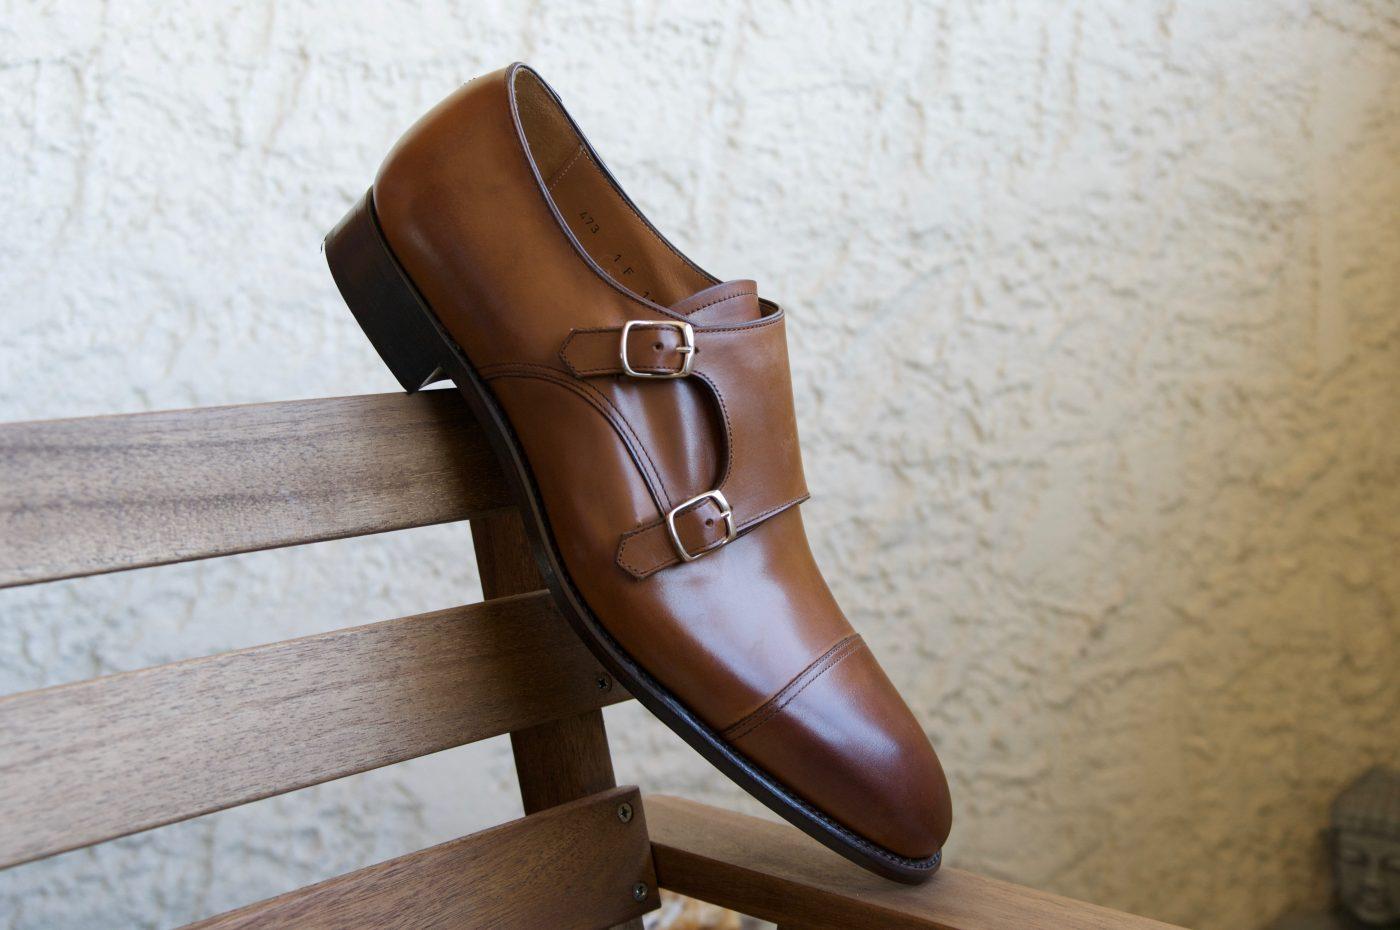 site de chaussure loding. Black Bedroom Furniture Sets. Home Design Ideas